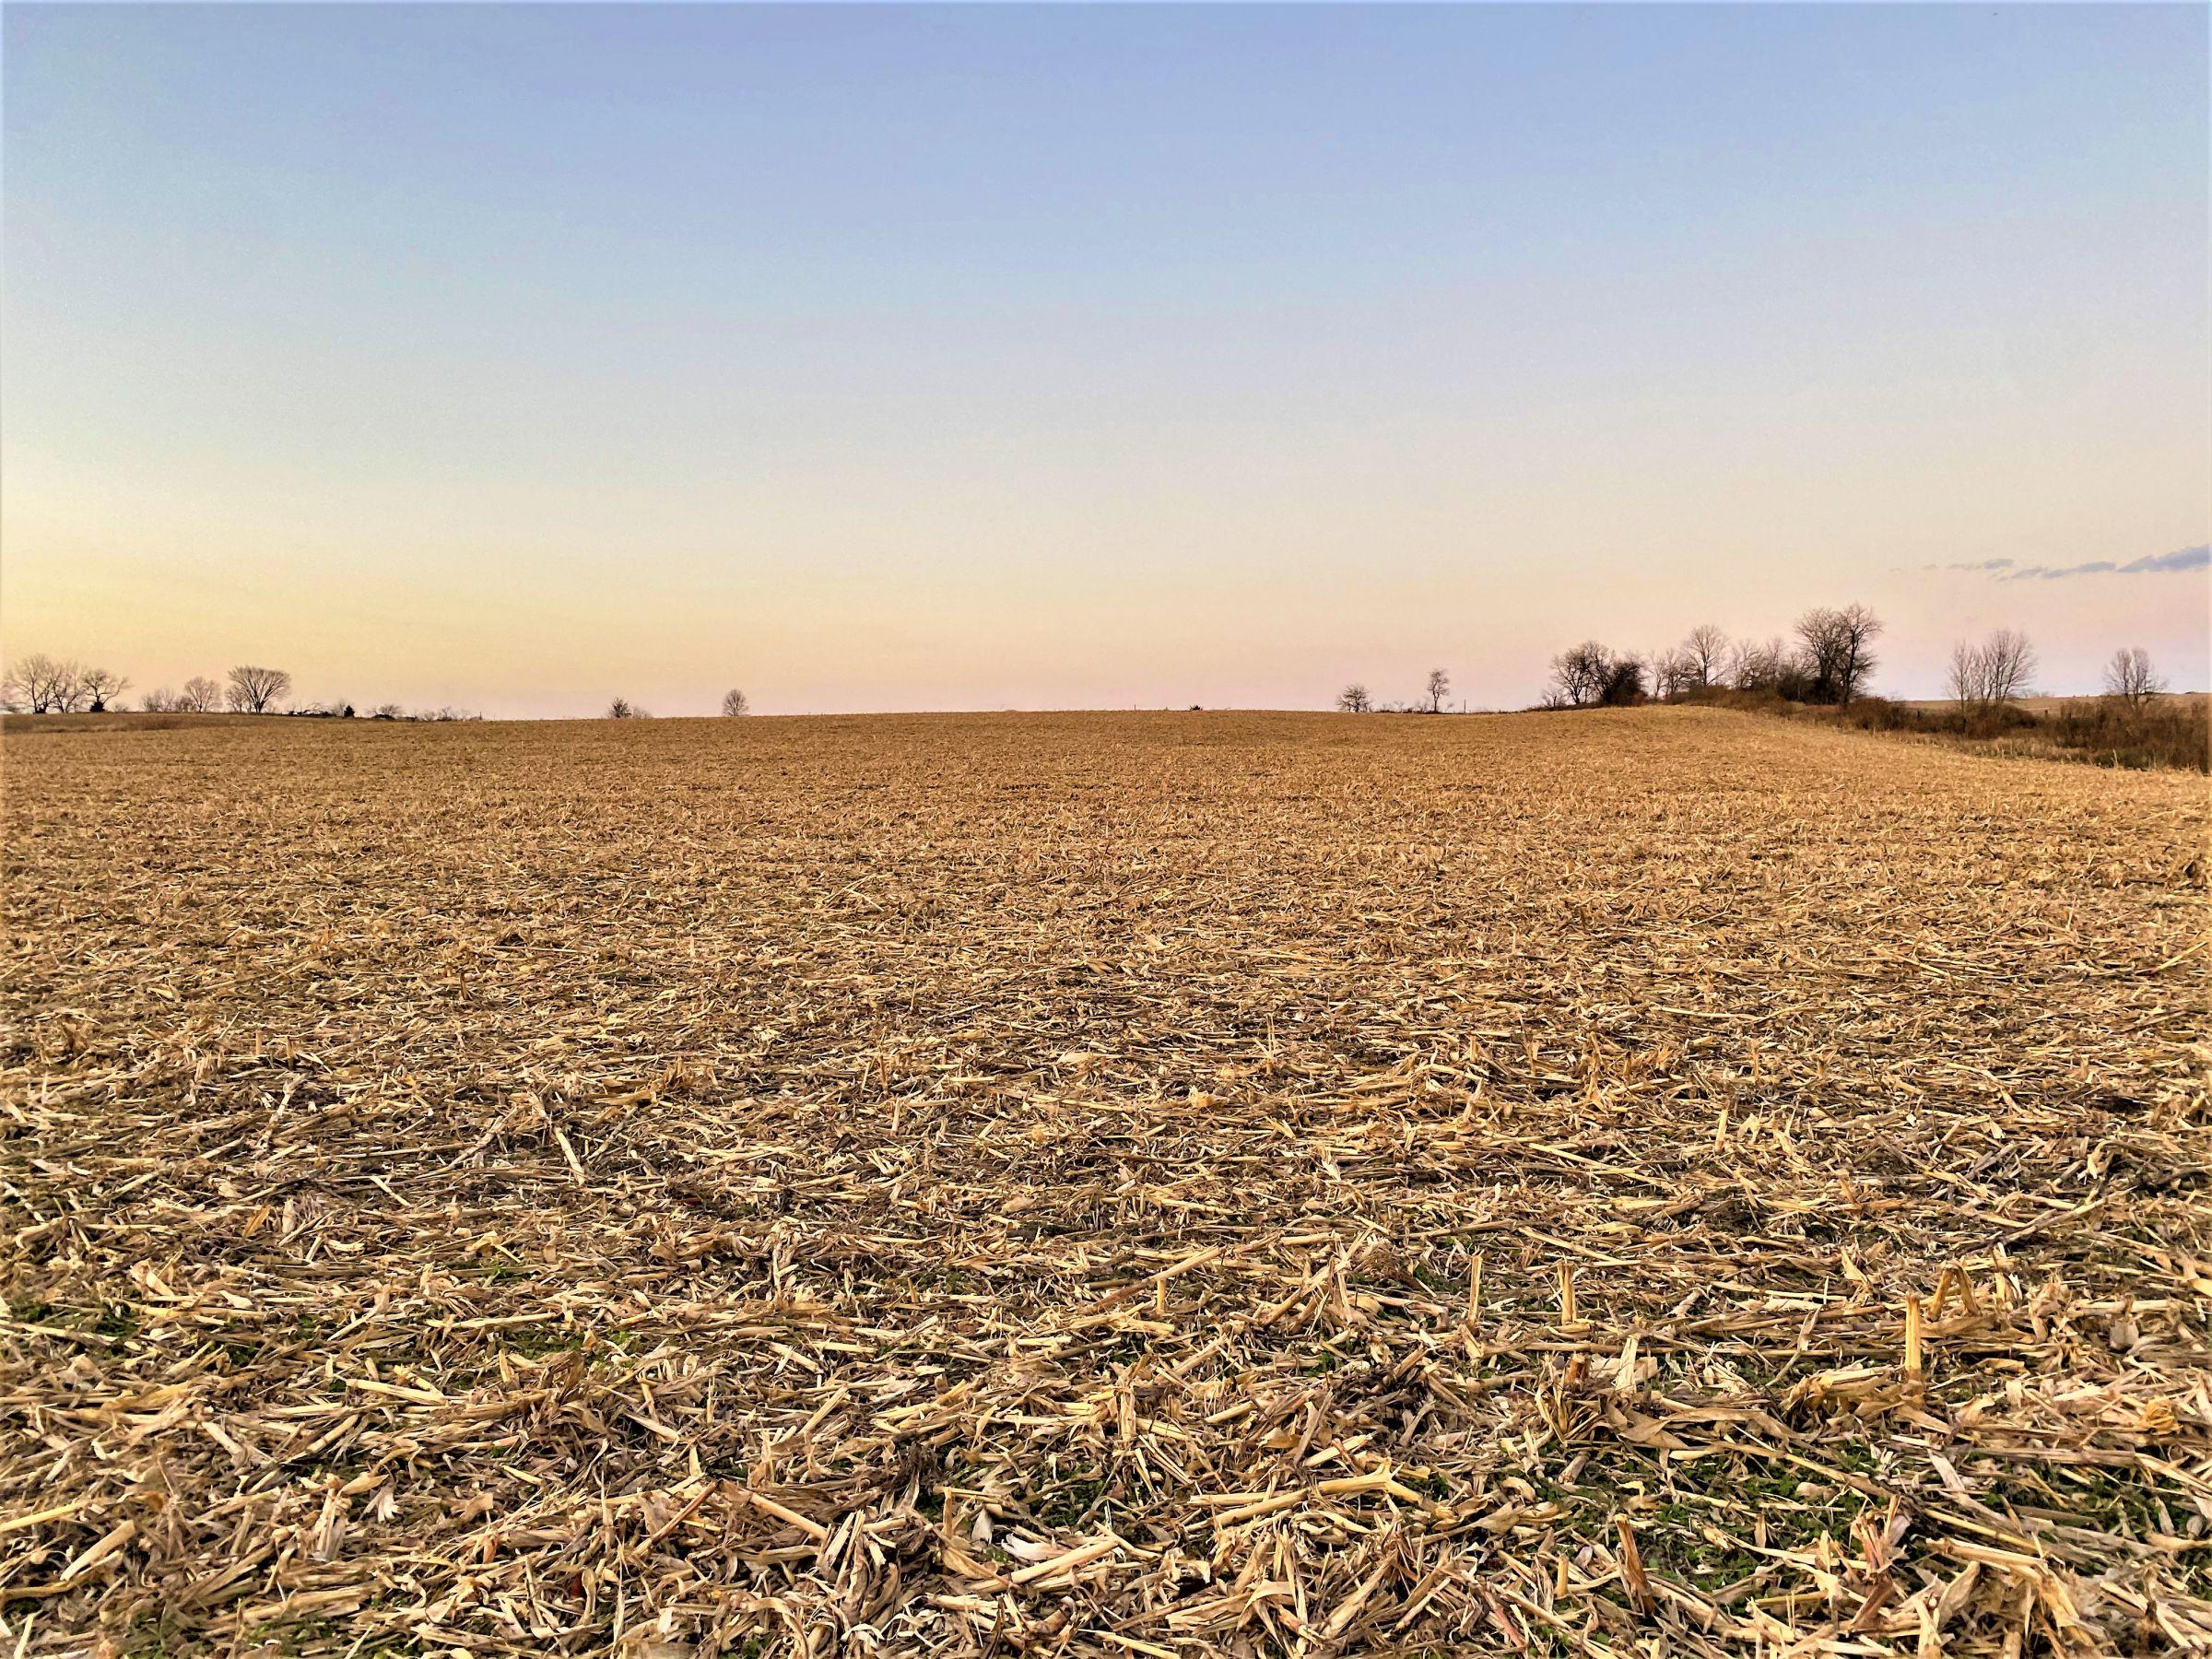 land-madison-county-iowa-20-acres-listing-number-15233-9-2020-11-10-001034.jpg